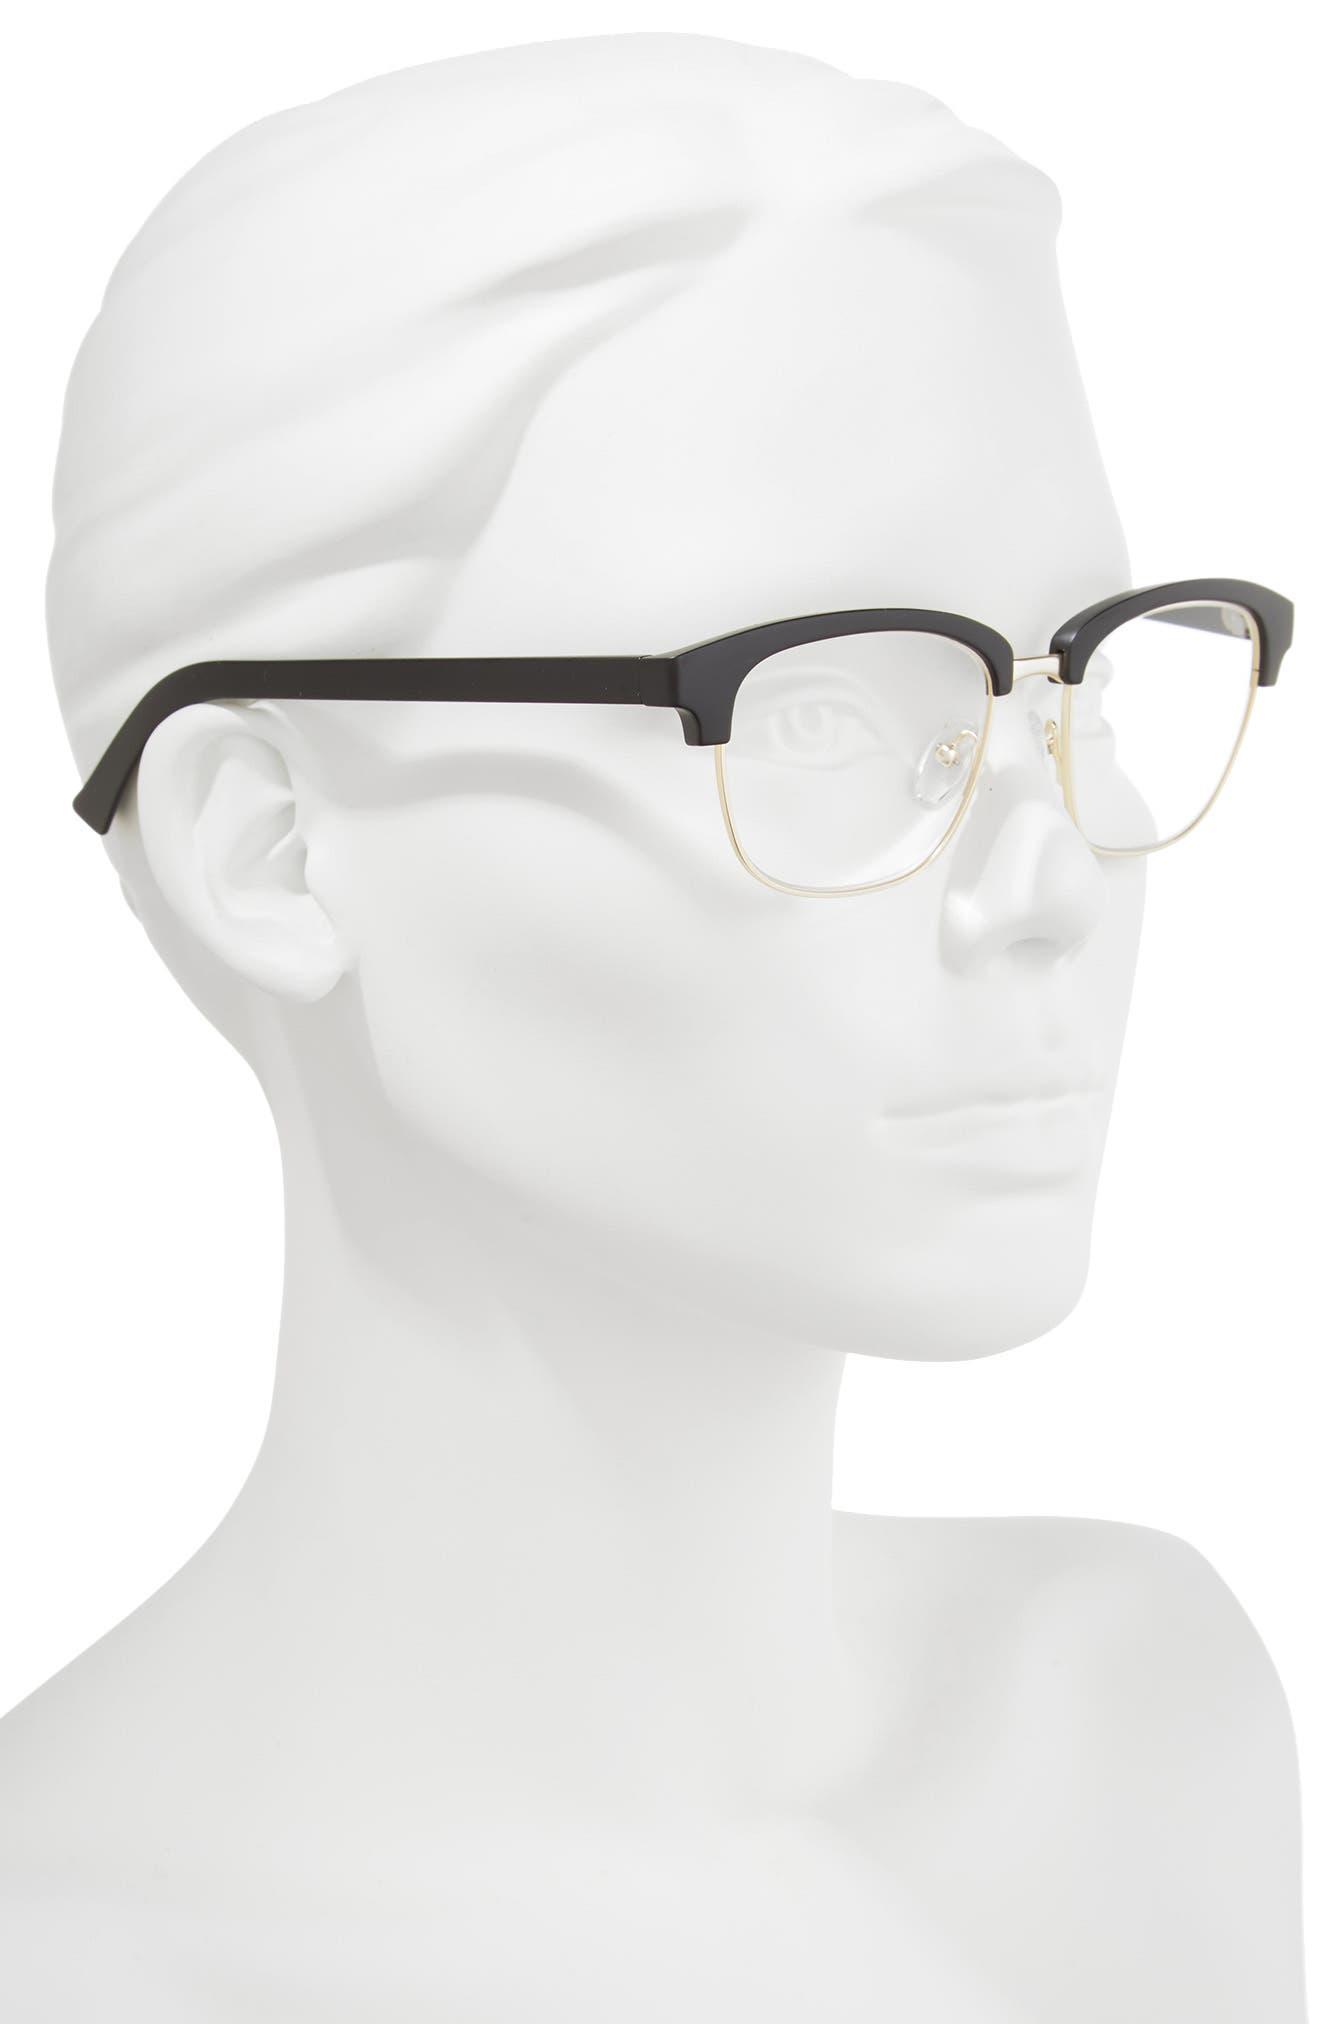 One Drew Over the English Test 52mm Reading Glasses,                             Alternate thumbnail 2, color,                             Black Marker